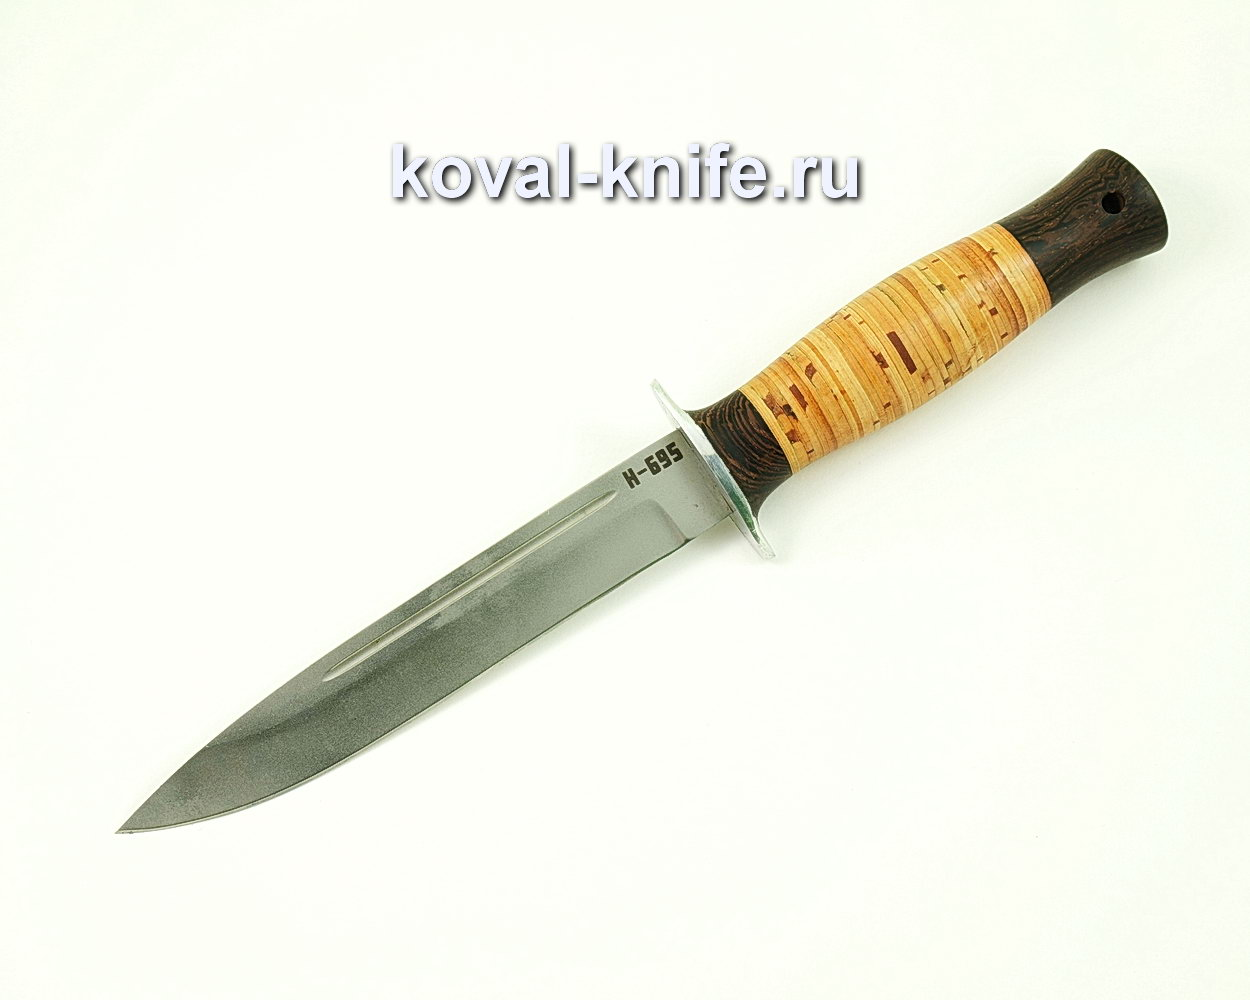 Нож Вишня из нержавеющей стали N695 (рукоять граб, береста) A415